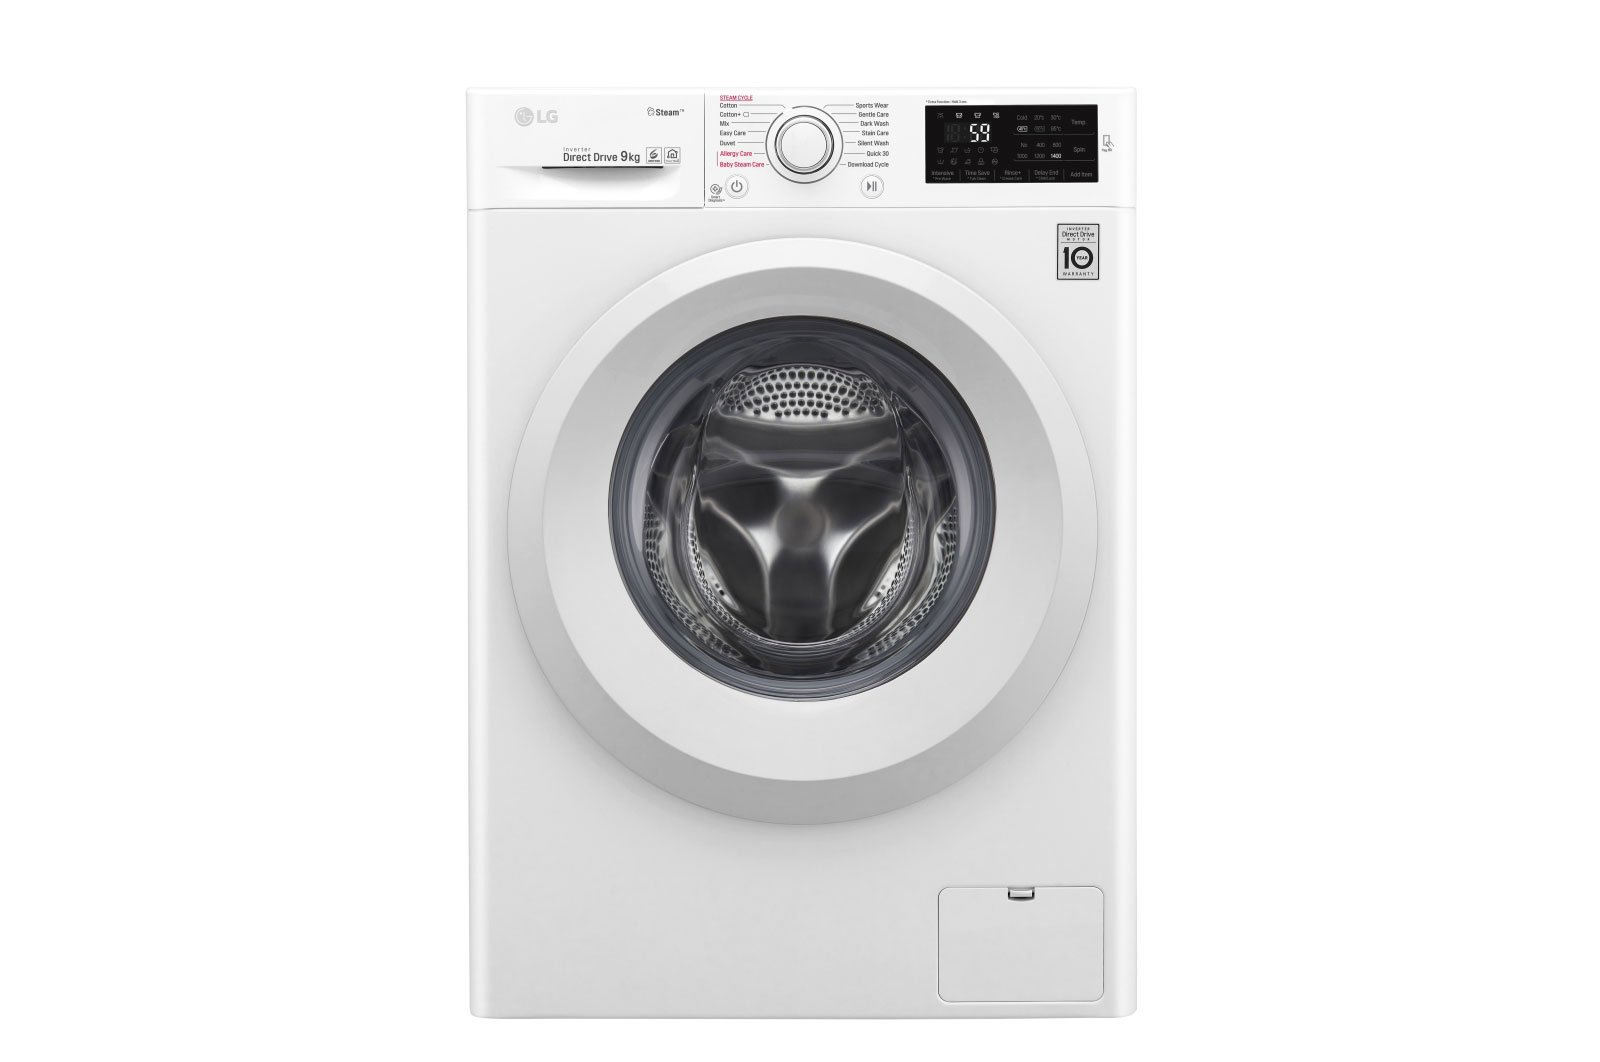 LG-f4j5vy3-W-autonome-Belastung-Bevor-9-kg-1400trmin-A-Wei-Waschmaschine-Waschmaschinen-autonome-bevor-Belastung-wei-Knpfe-drehbar-Berhren-150–wei